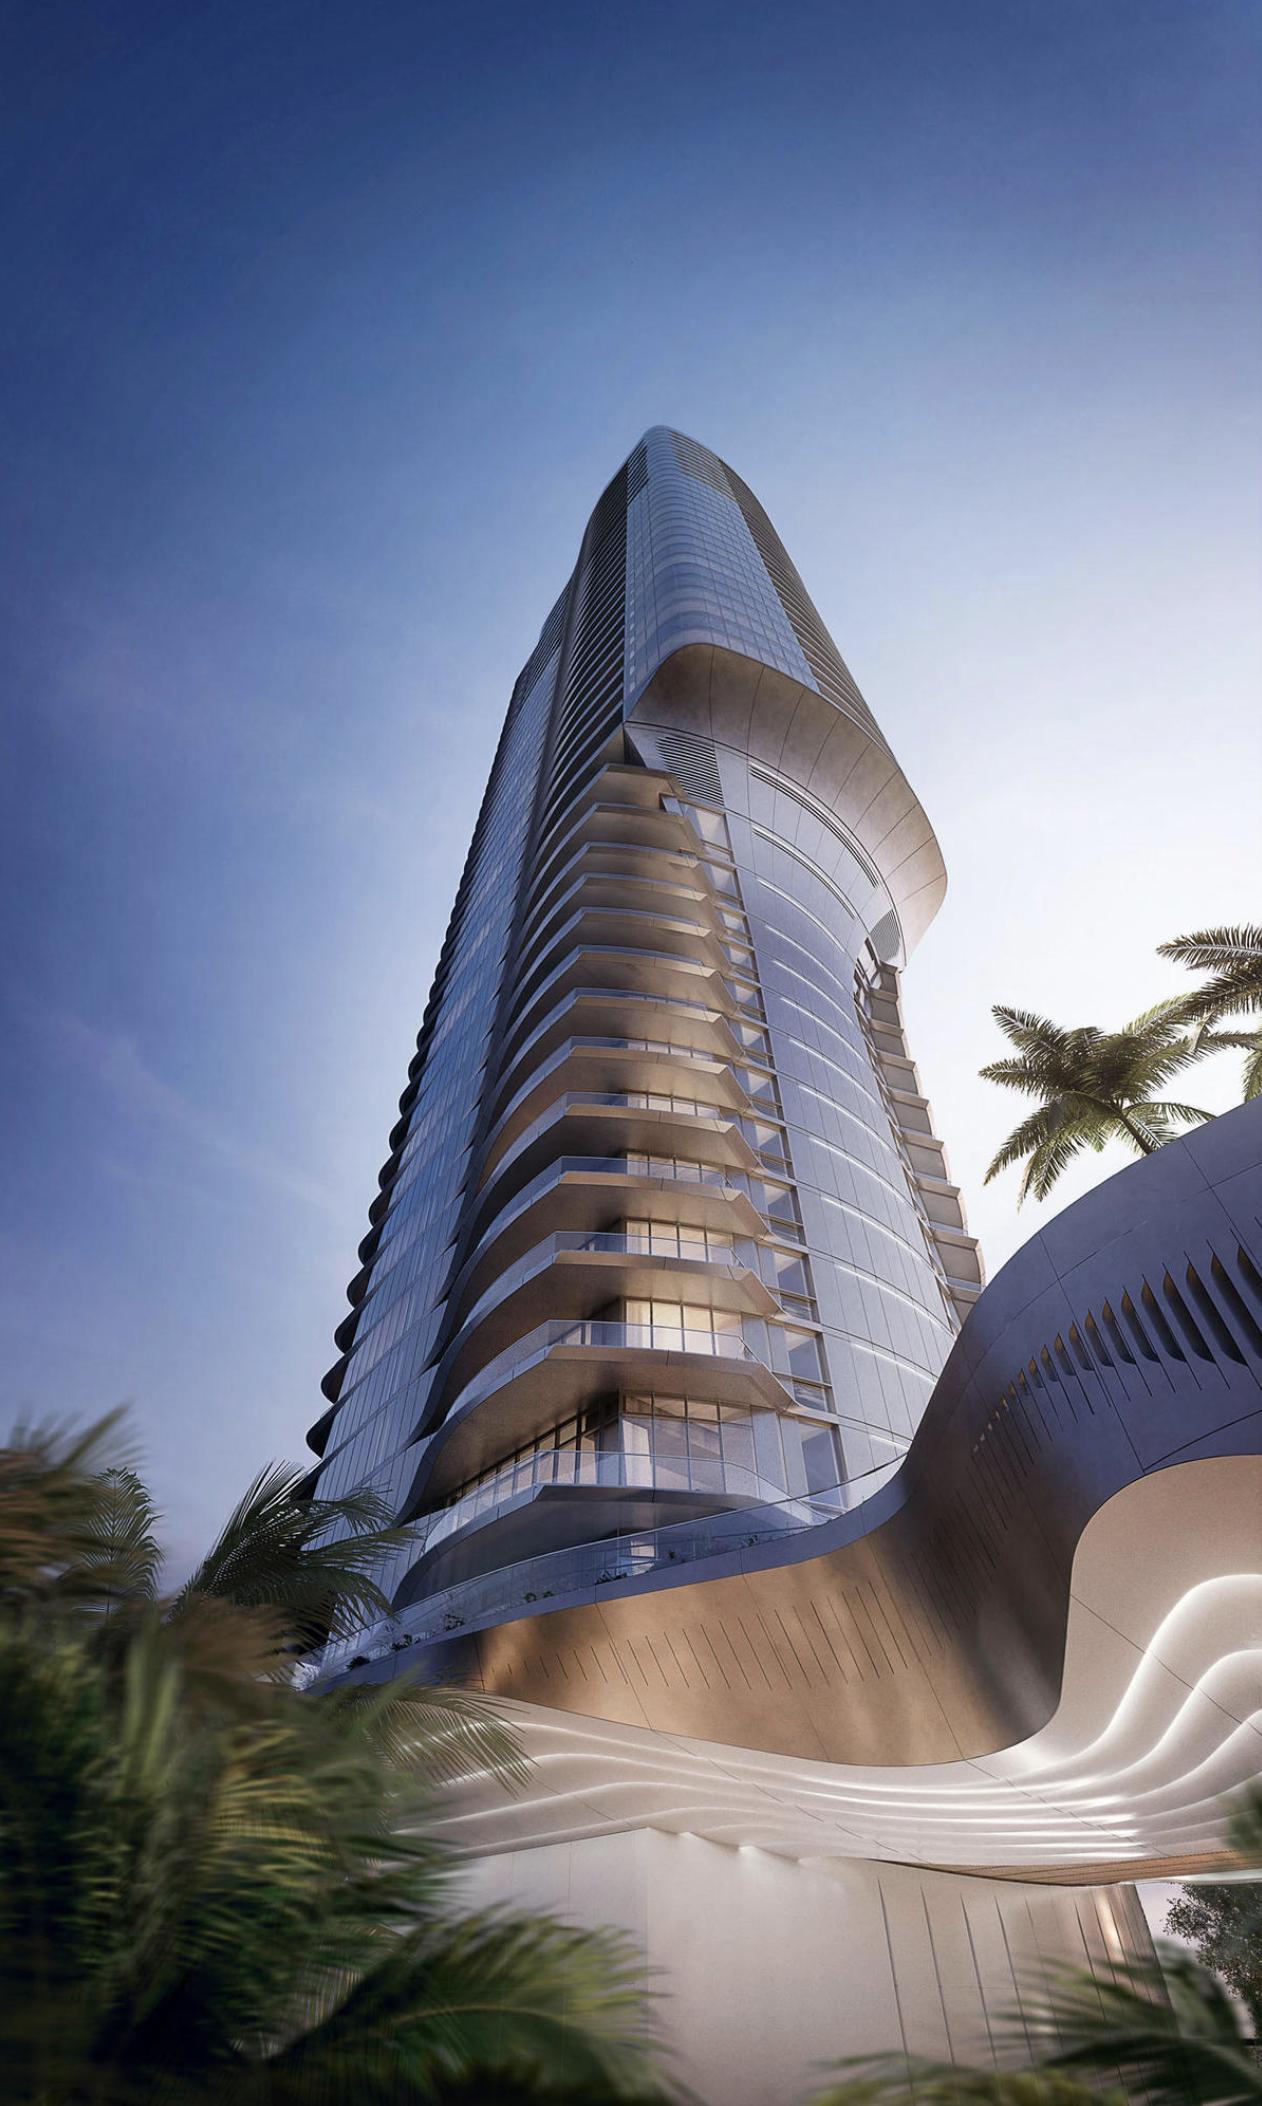 Una Residences. Designed by Adrian Smith + Gordon Gill Architecture.